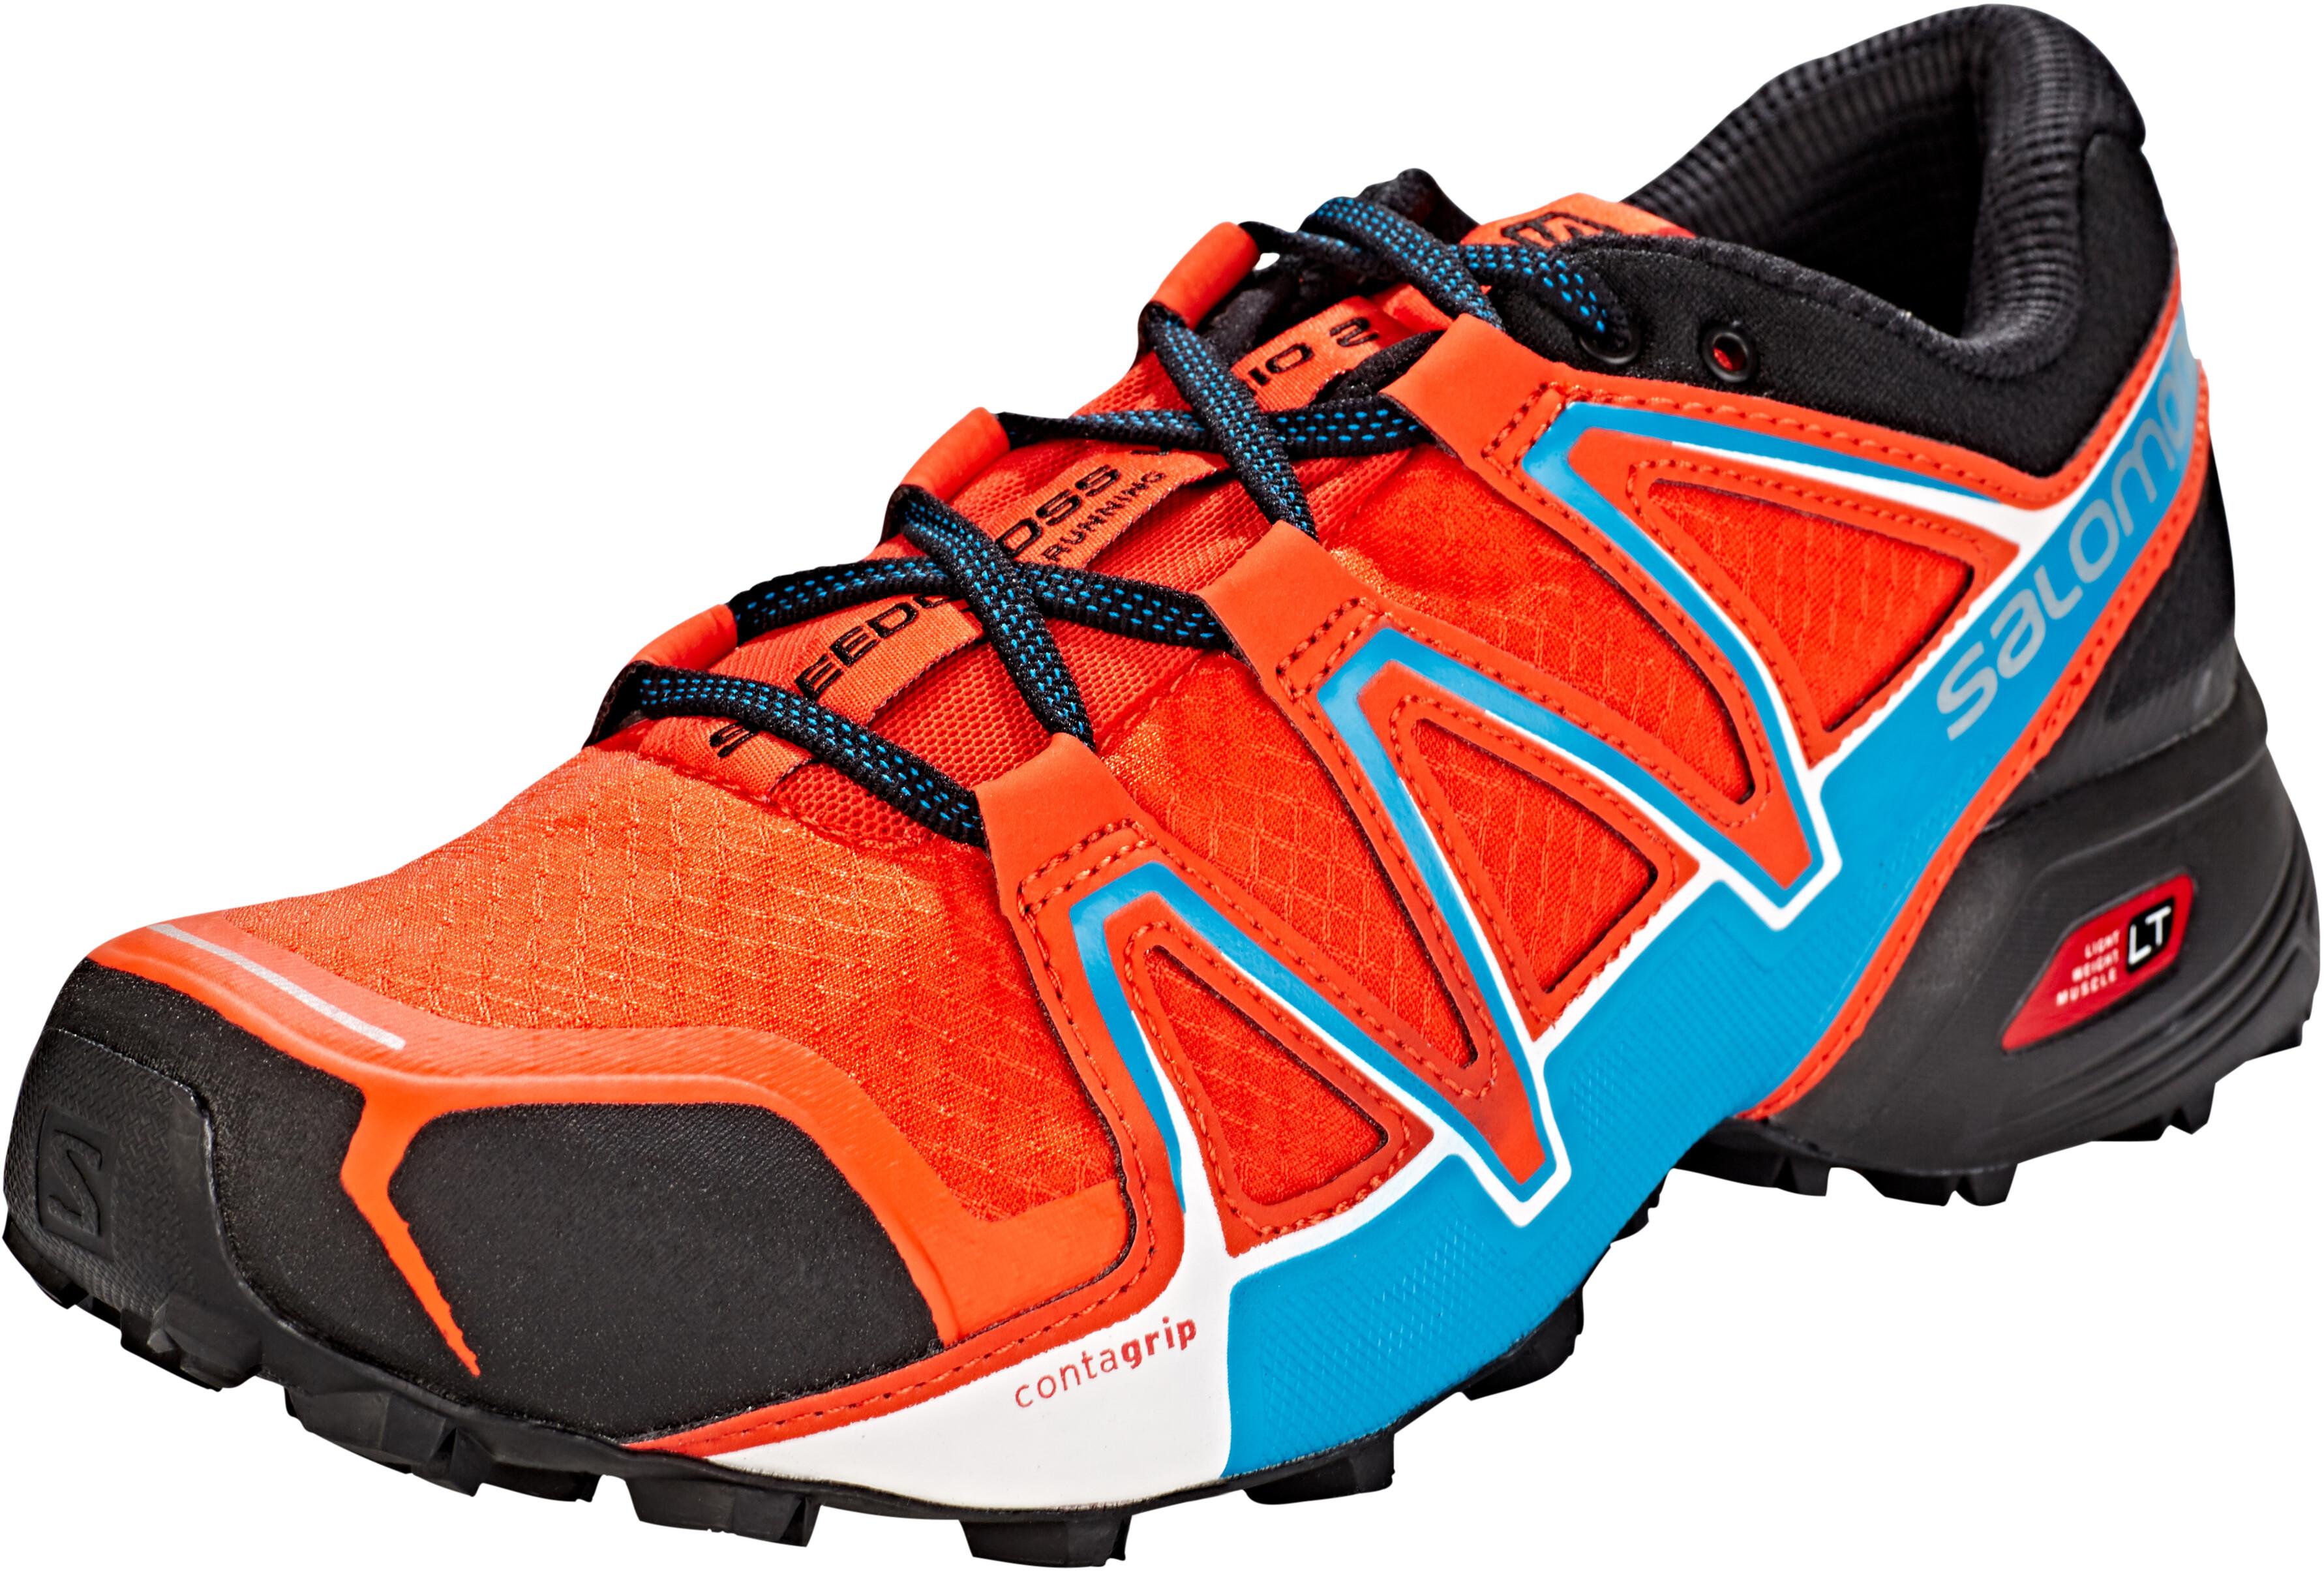 87b5931573ee Salomon Speedcross Vario 2 Running Shoes Men orange black at ...